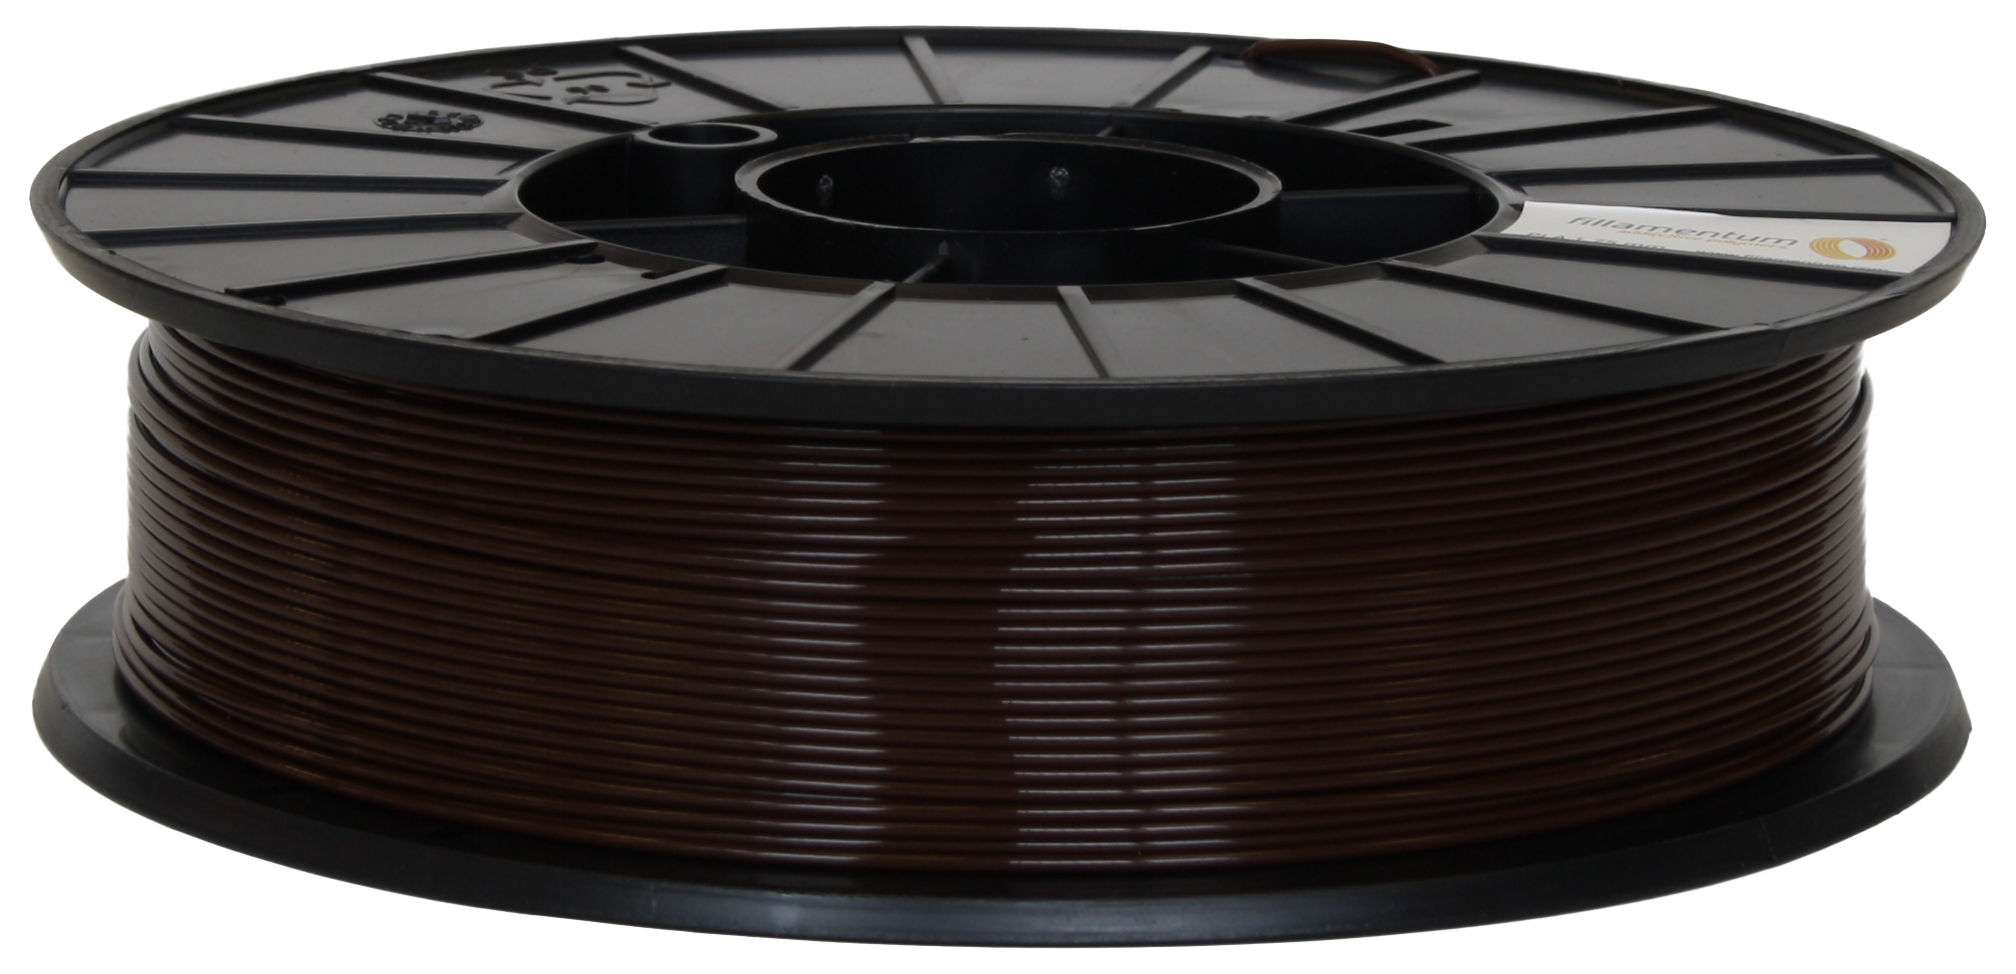 Fillamentum PLA Extrafill 1.75 mm Chocolate Brown